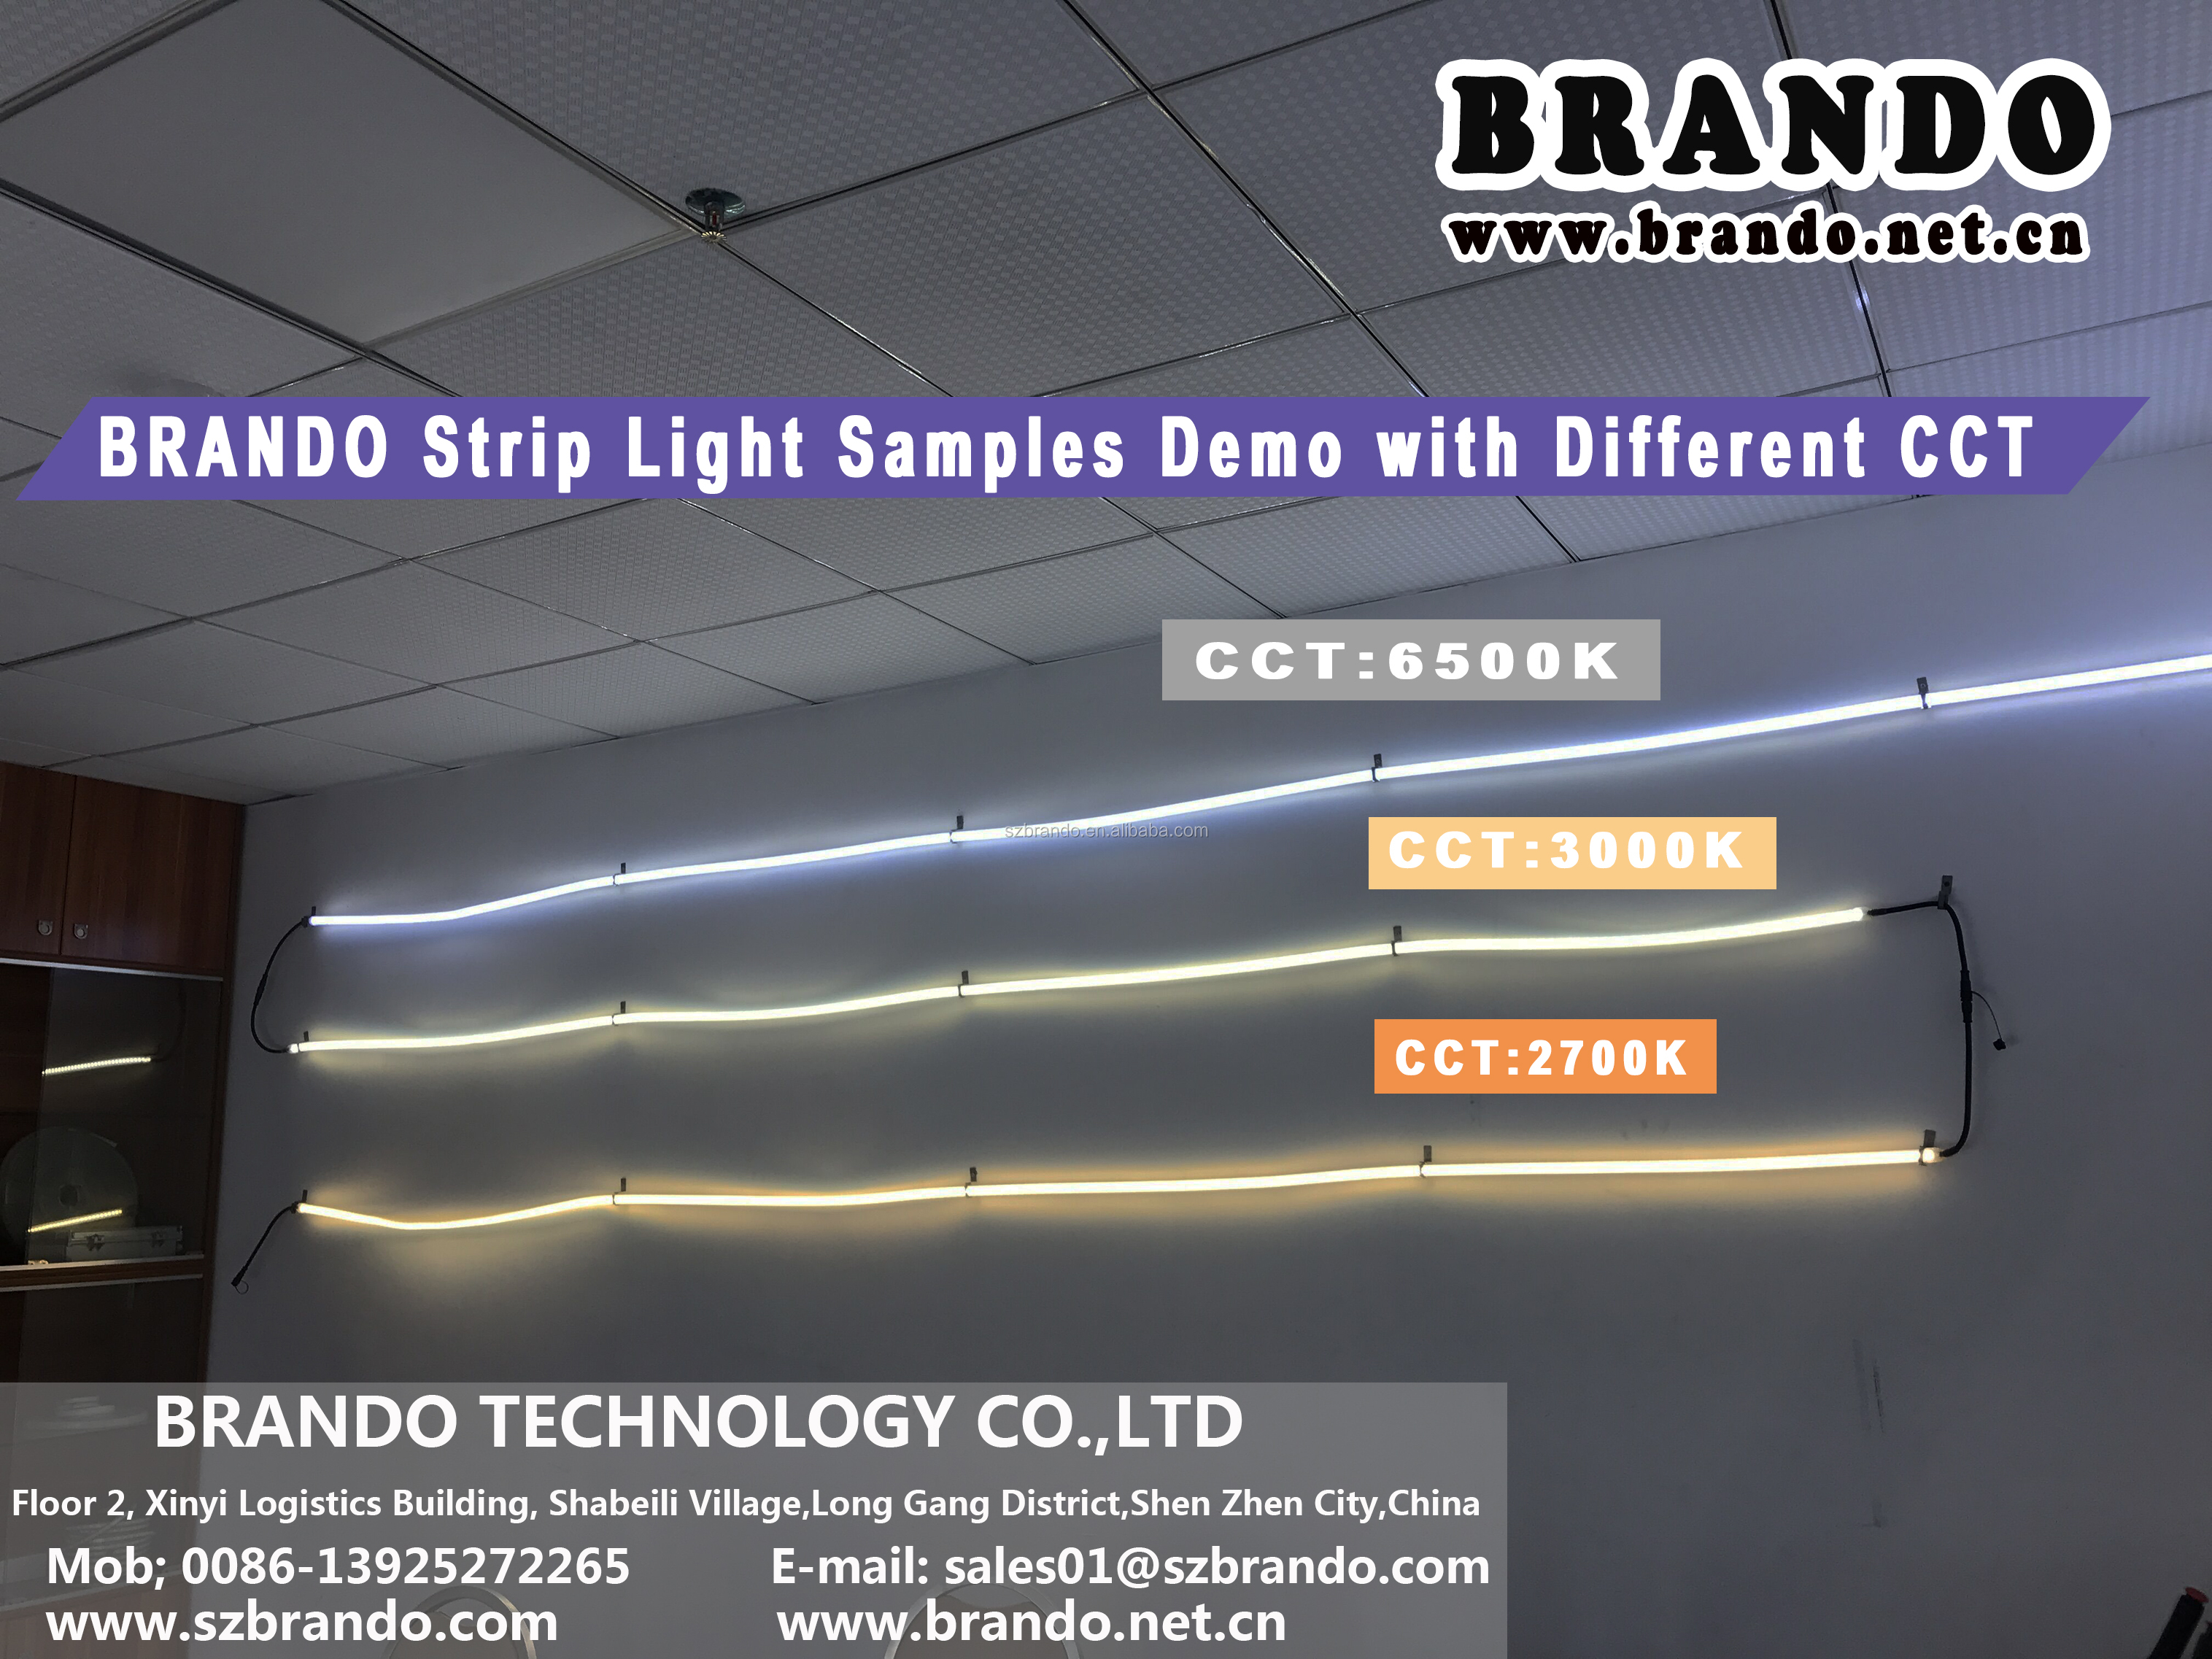 BRANDO strip light demo 2.jpg